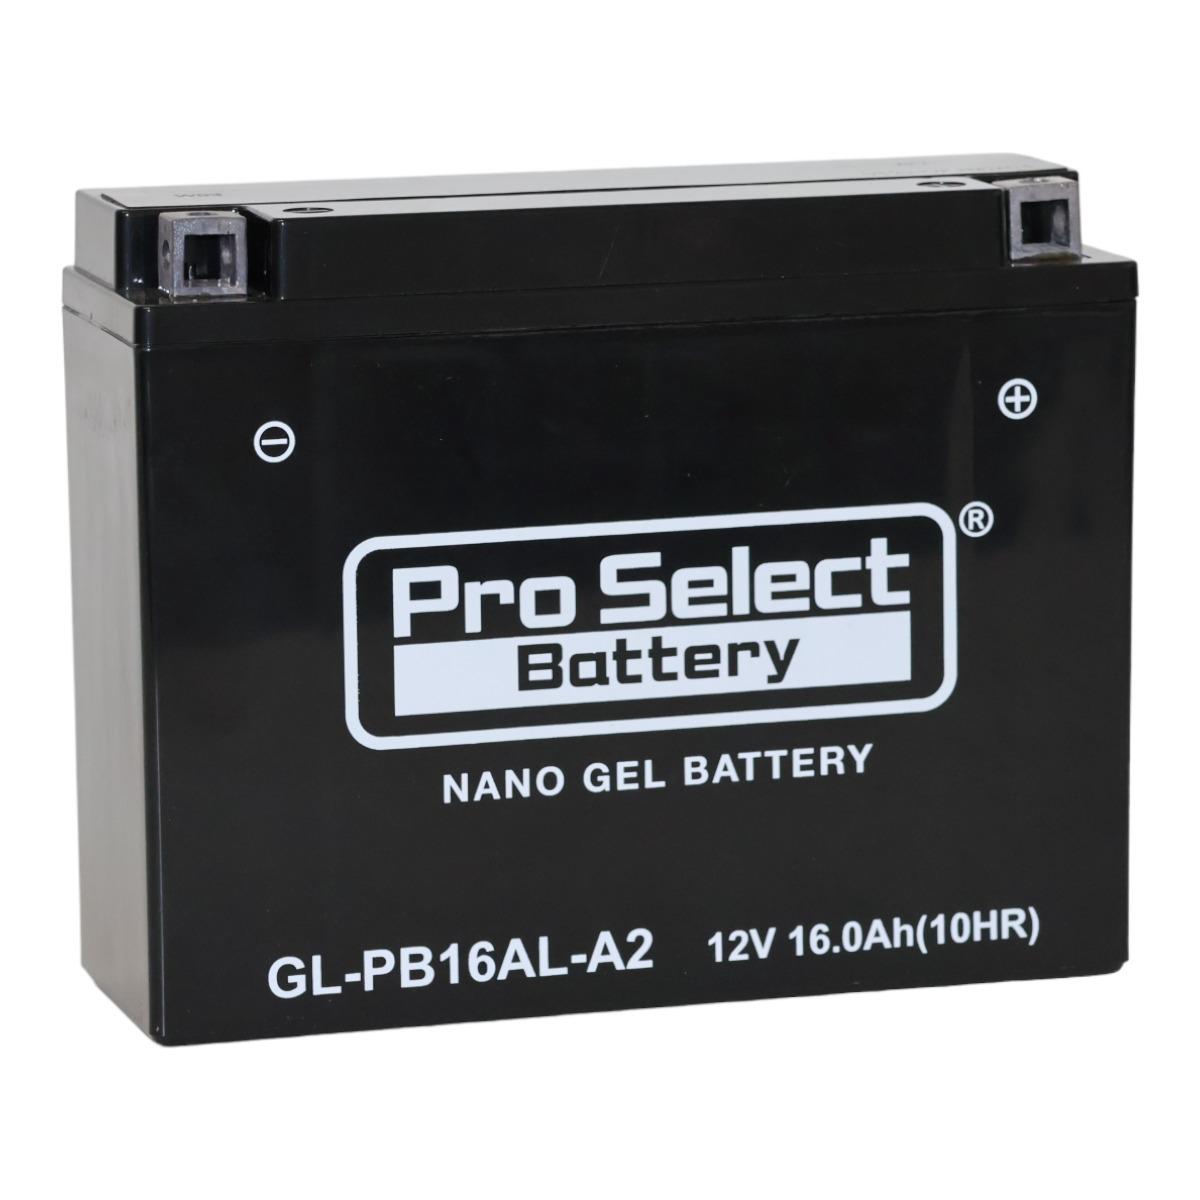 GL-PB16AL-A2 (YB16AL-A2 互換)(ジェルタイプ 液入り充電済み)